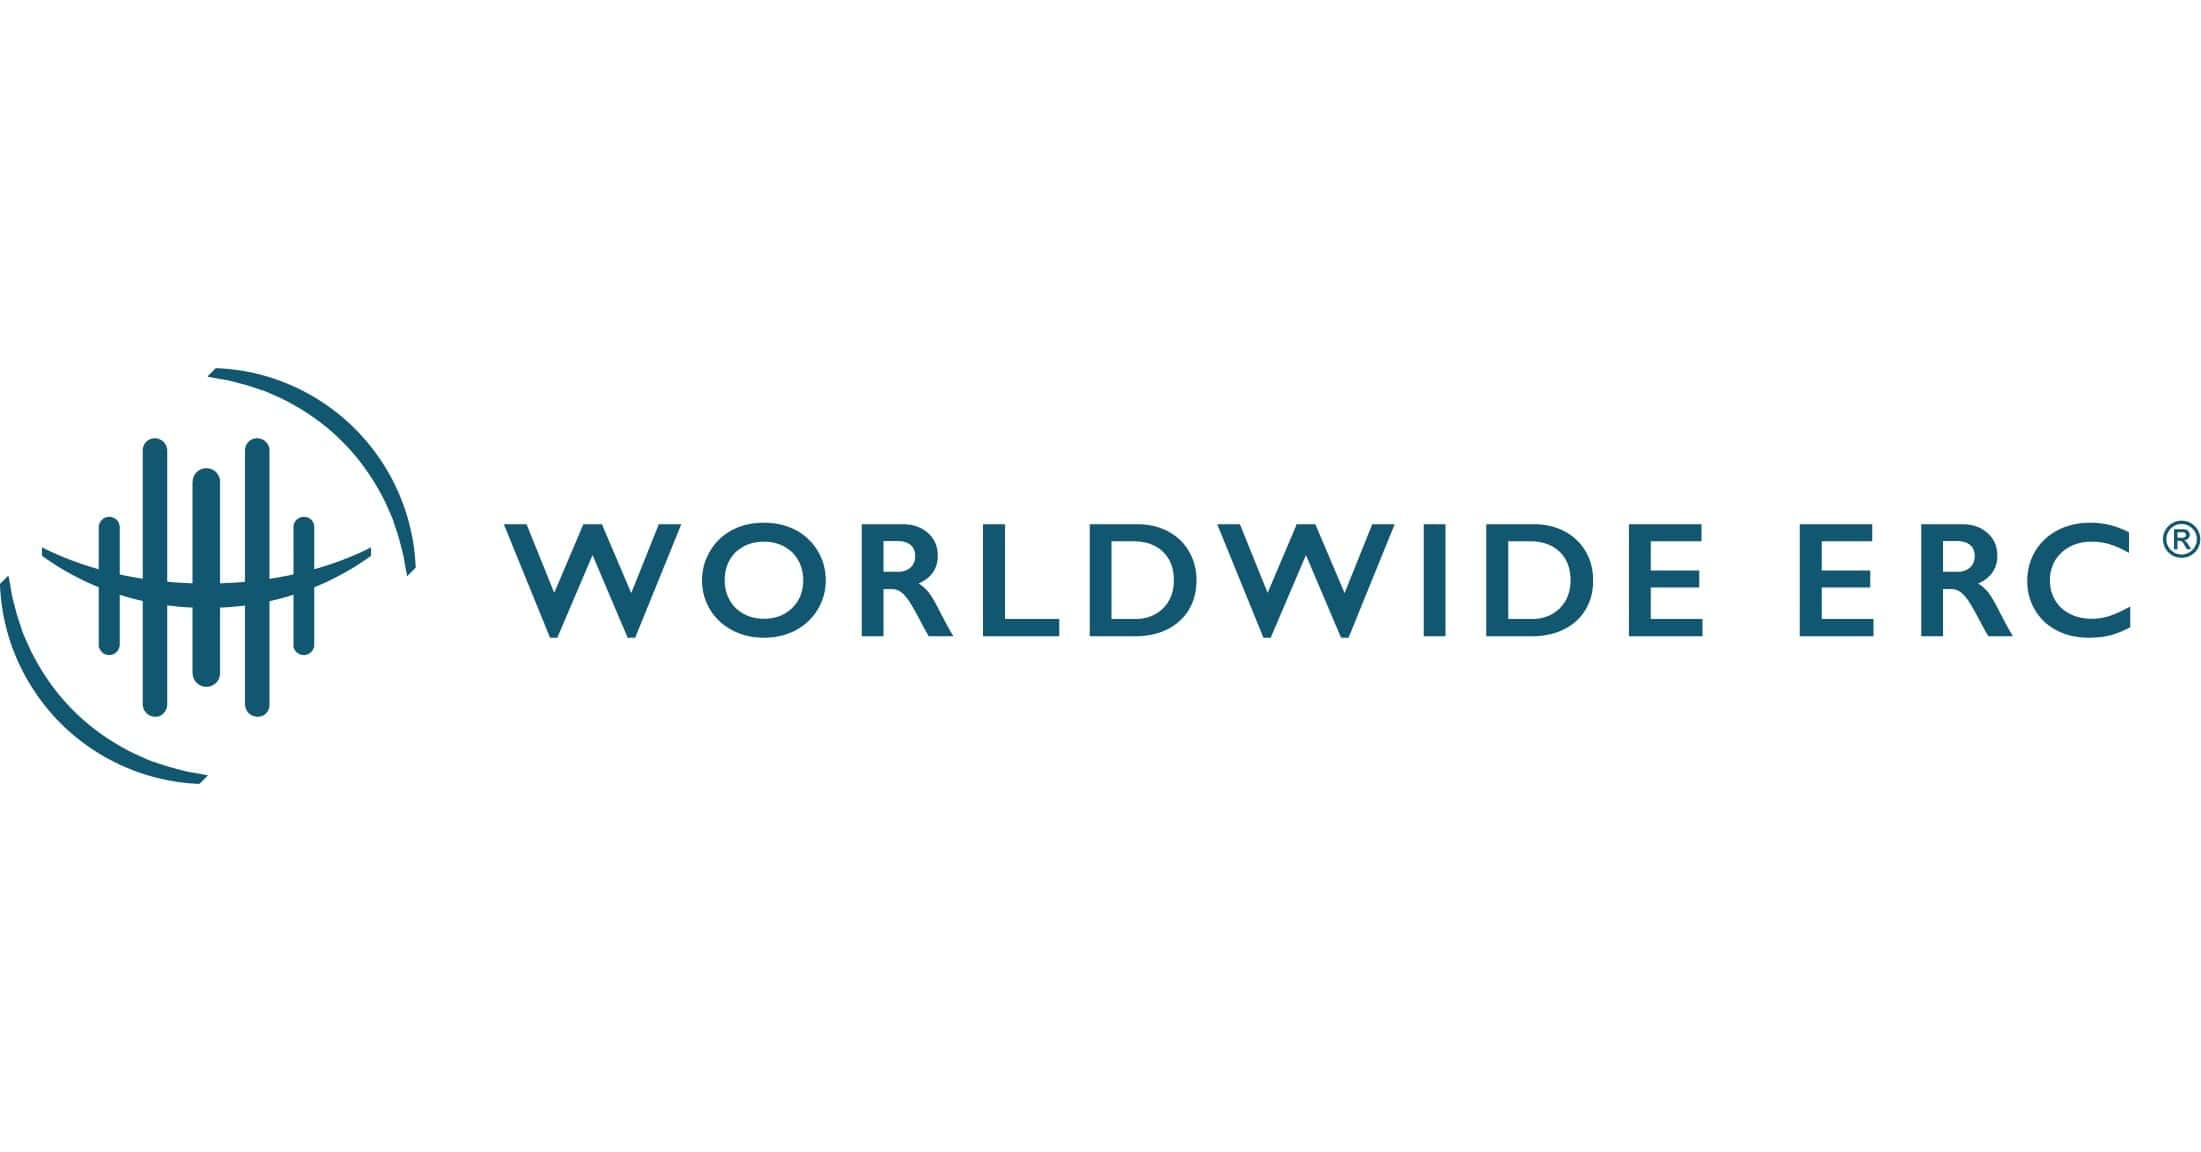 Worldwide ERC logo